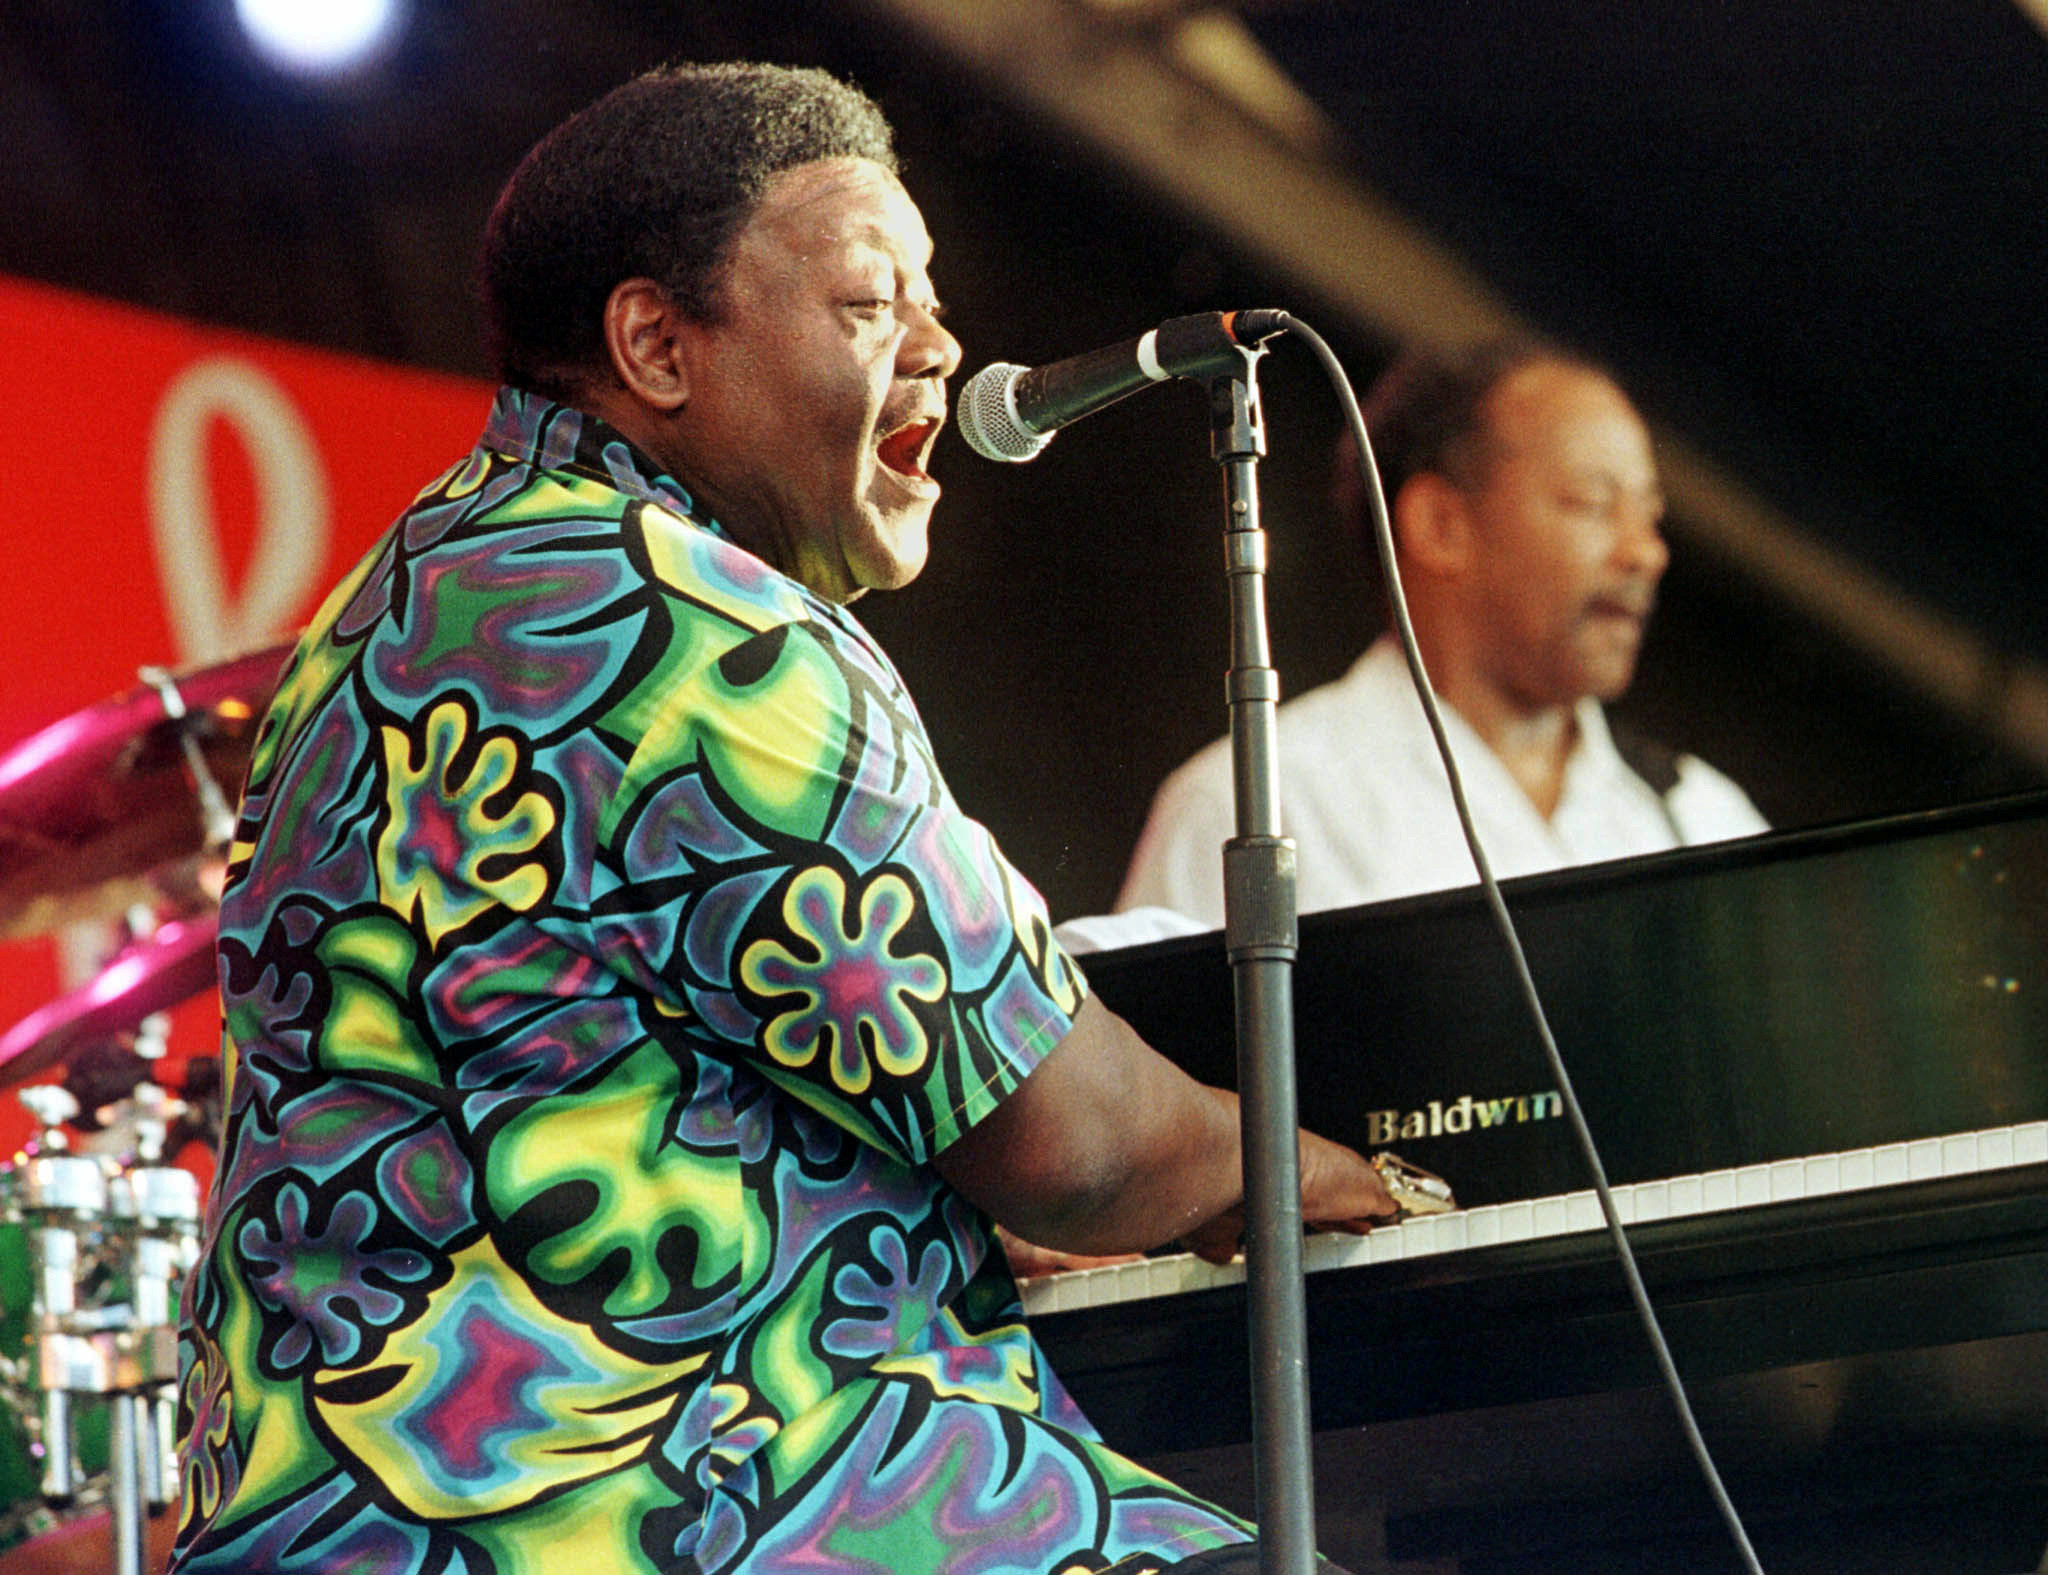 Fats Domino, rock 'n' roll pioneer, dead at 89